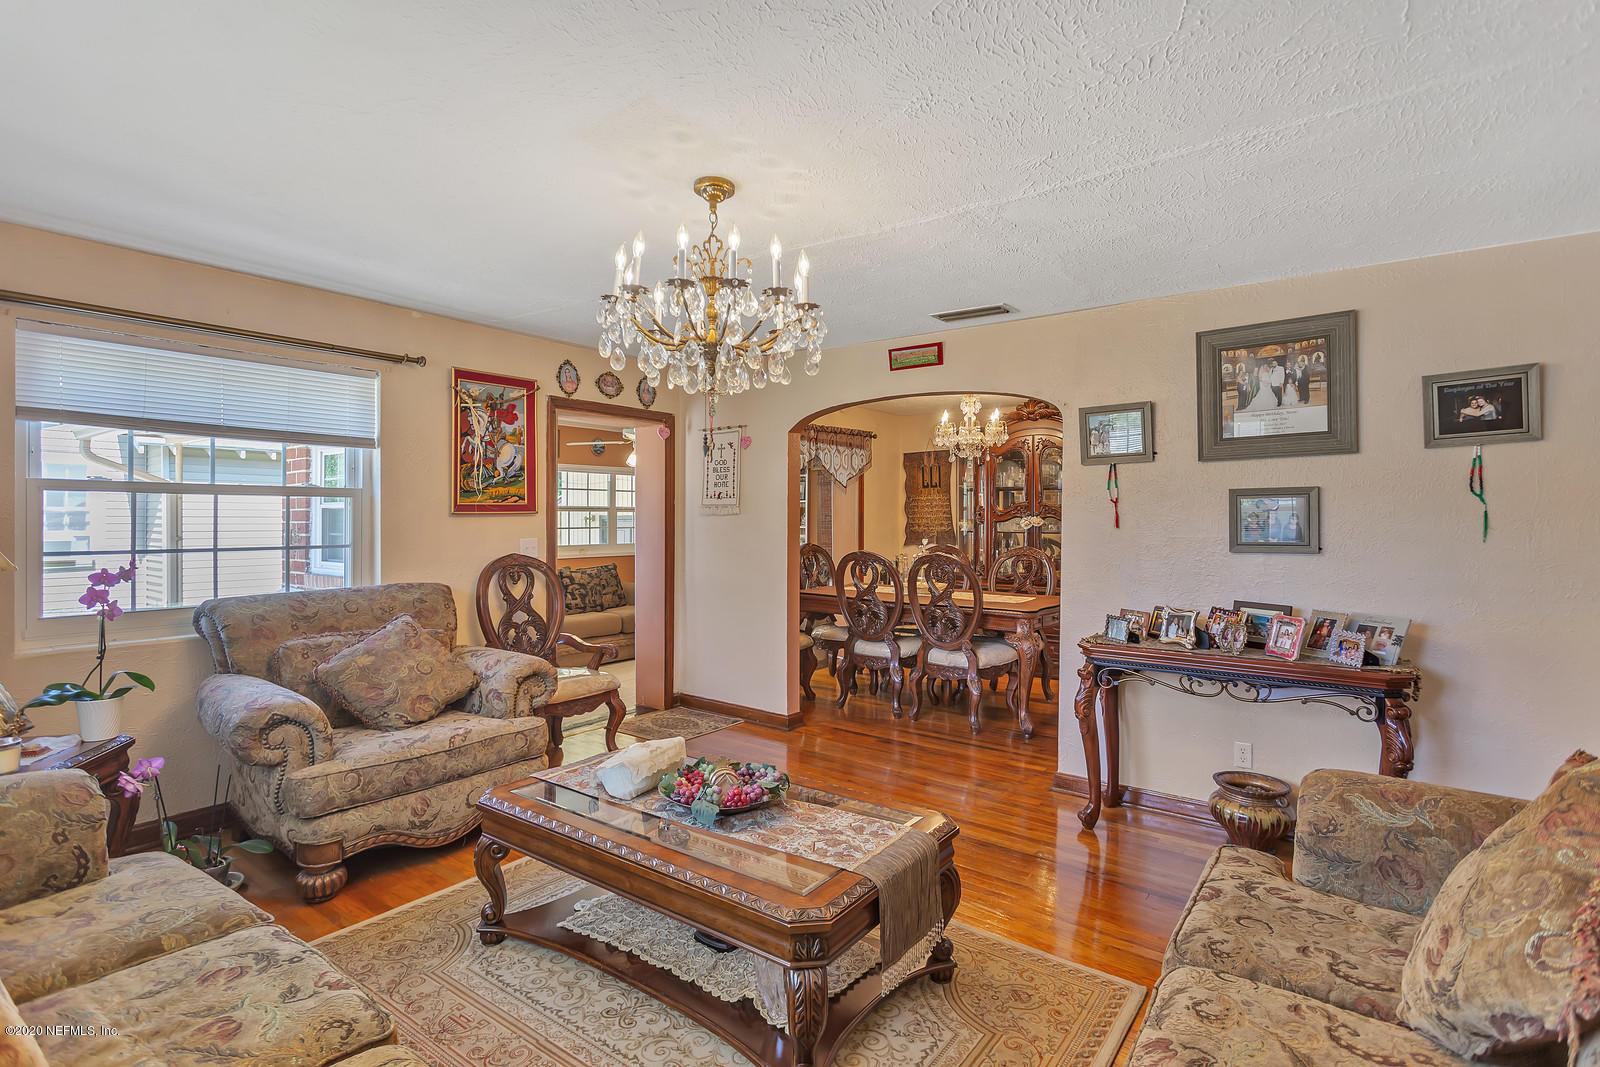 1615 SHERIDAN, JACKSONVILLE, FLORIDA 32207, 4 Bedrooms Bedrooms, ,3 BathroomsBathrooms,Residential,For sale,SHERIDAN,1053148